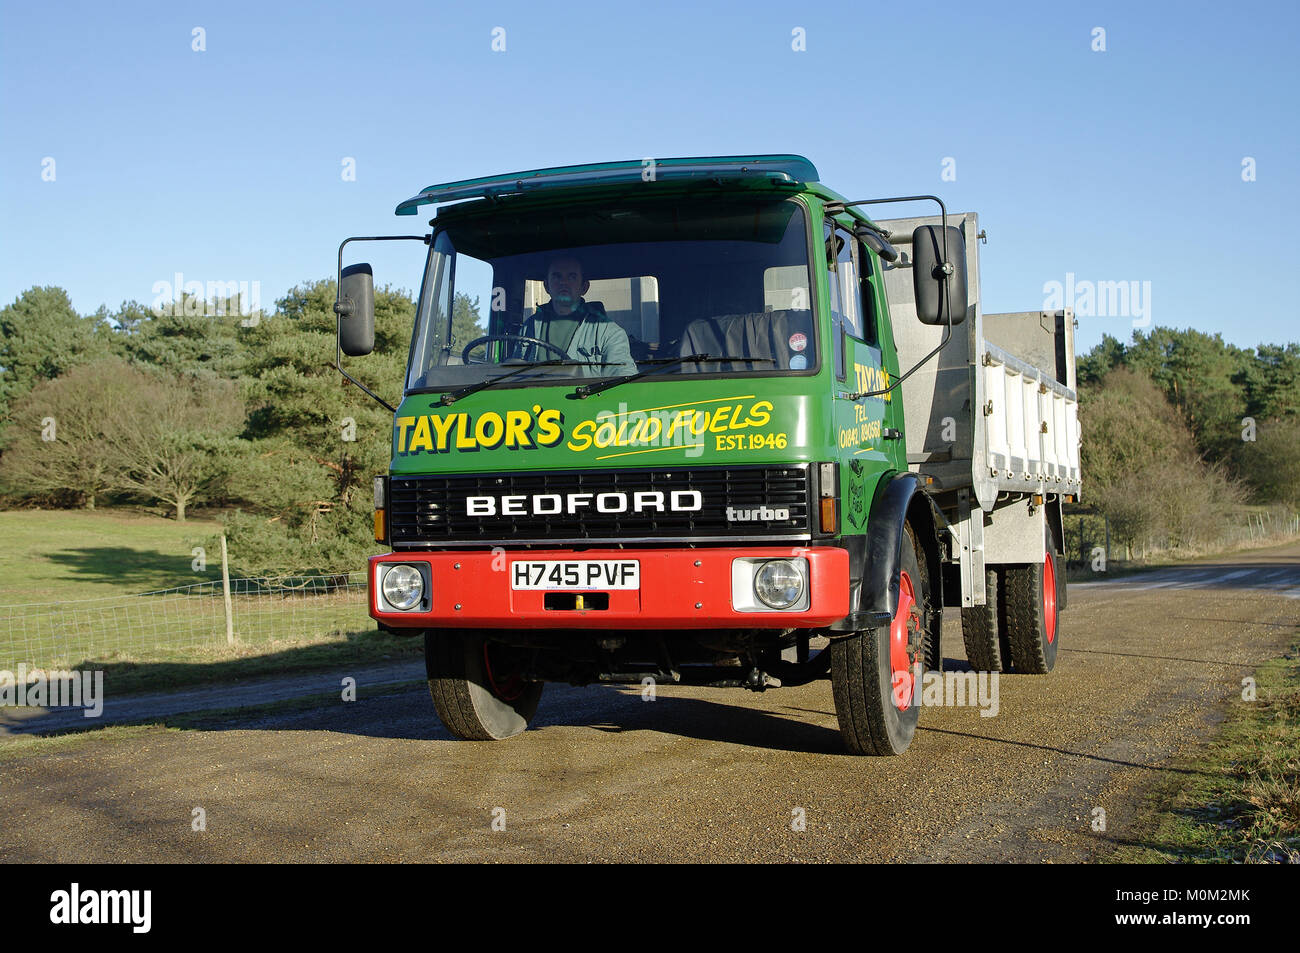 Bedford TL tipper Stock Photo